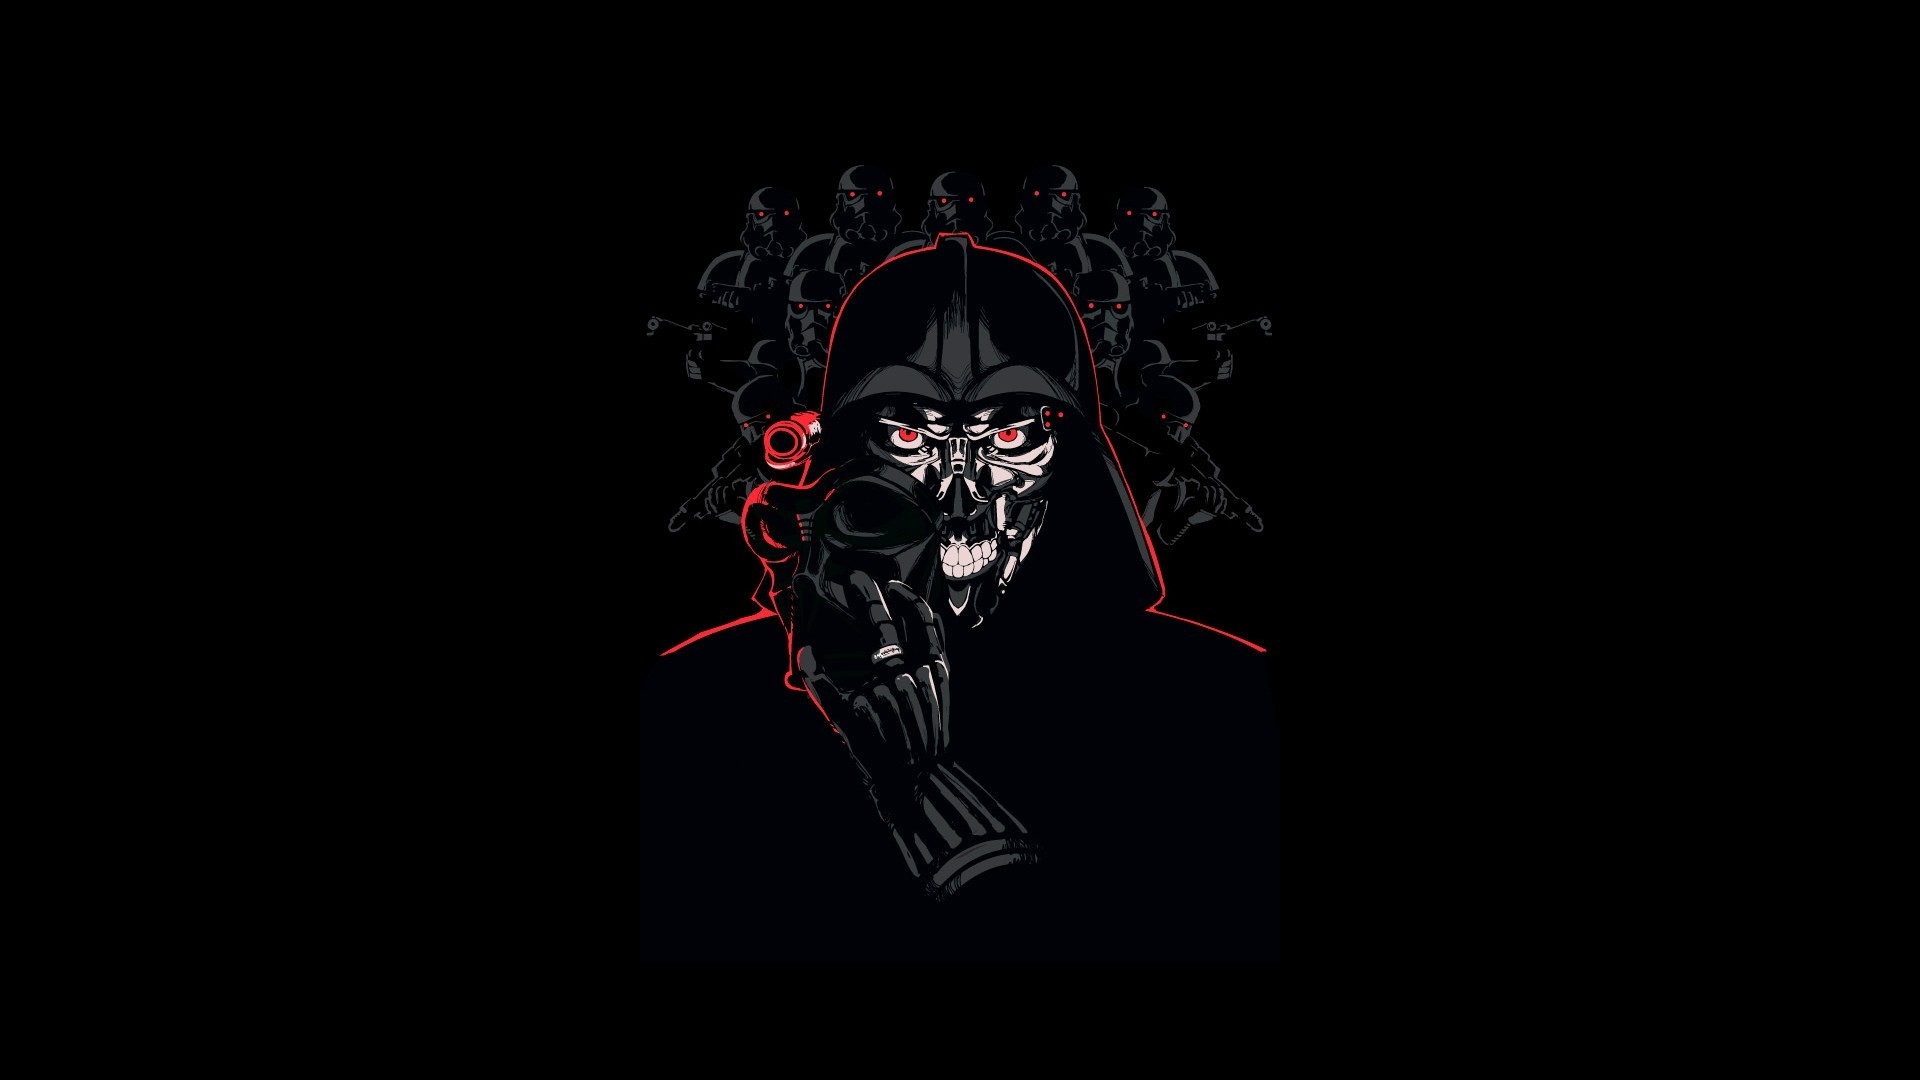 Darth Vader Wallpaper Iphone: 1920x1080px Darth Vader Background